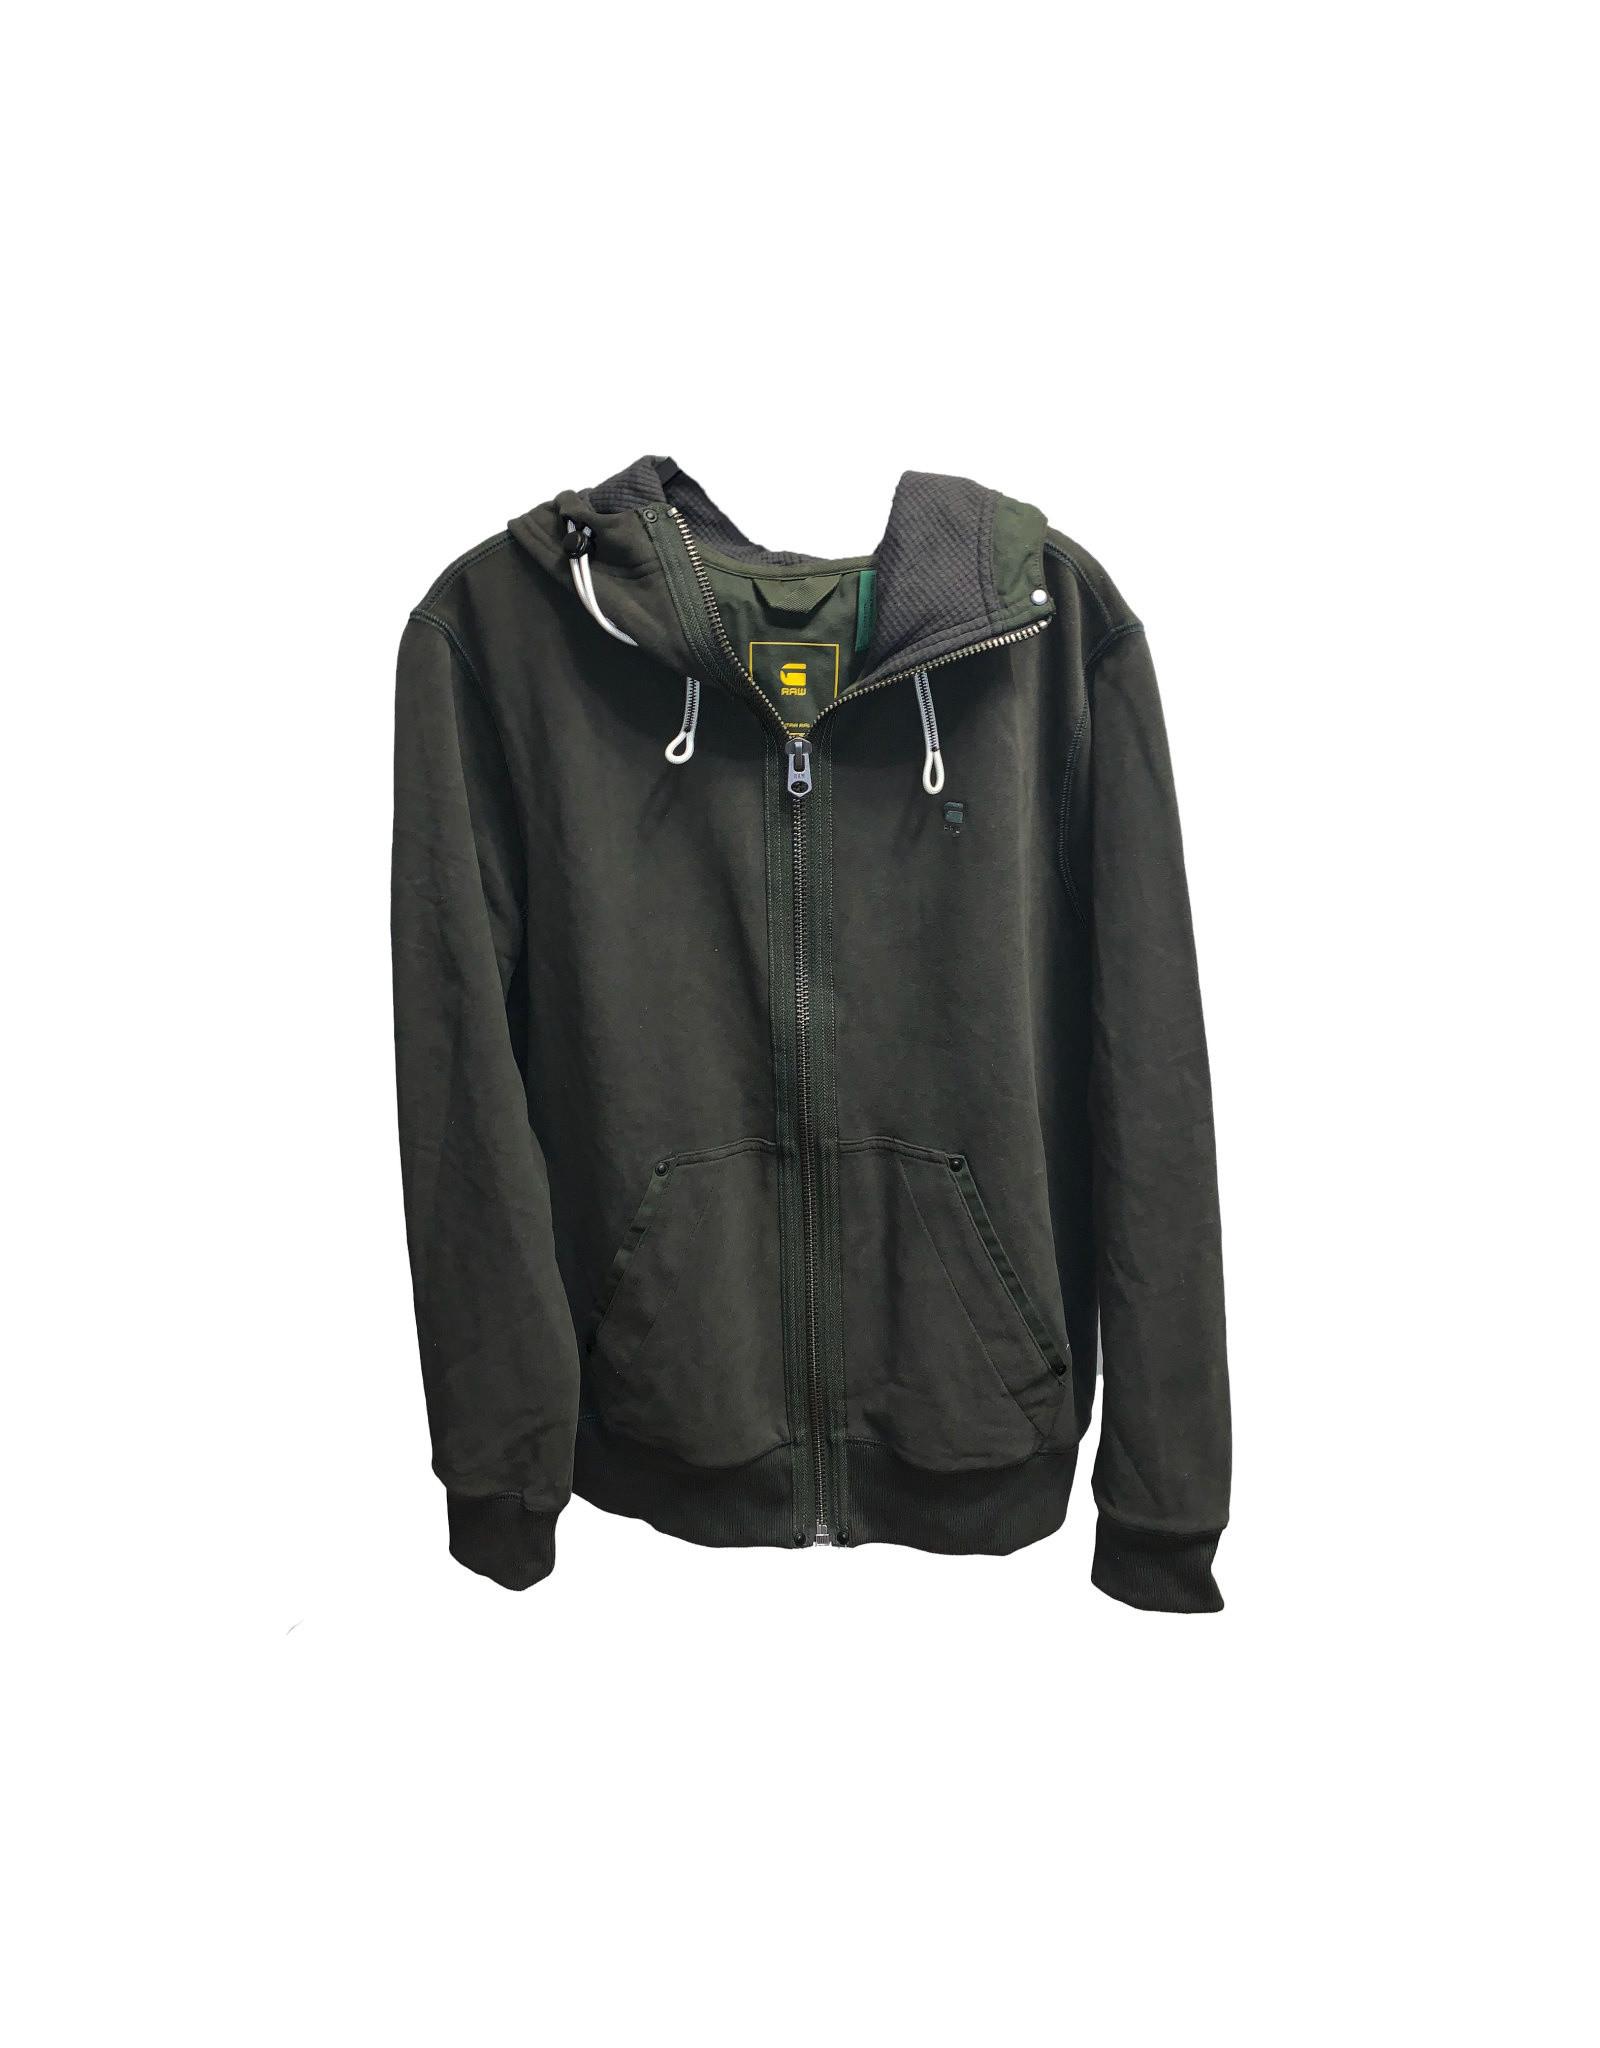 G-Star Raw G-Star Raw  Zip Front hoodie SizeM